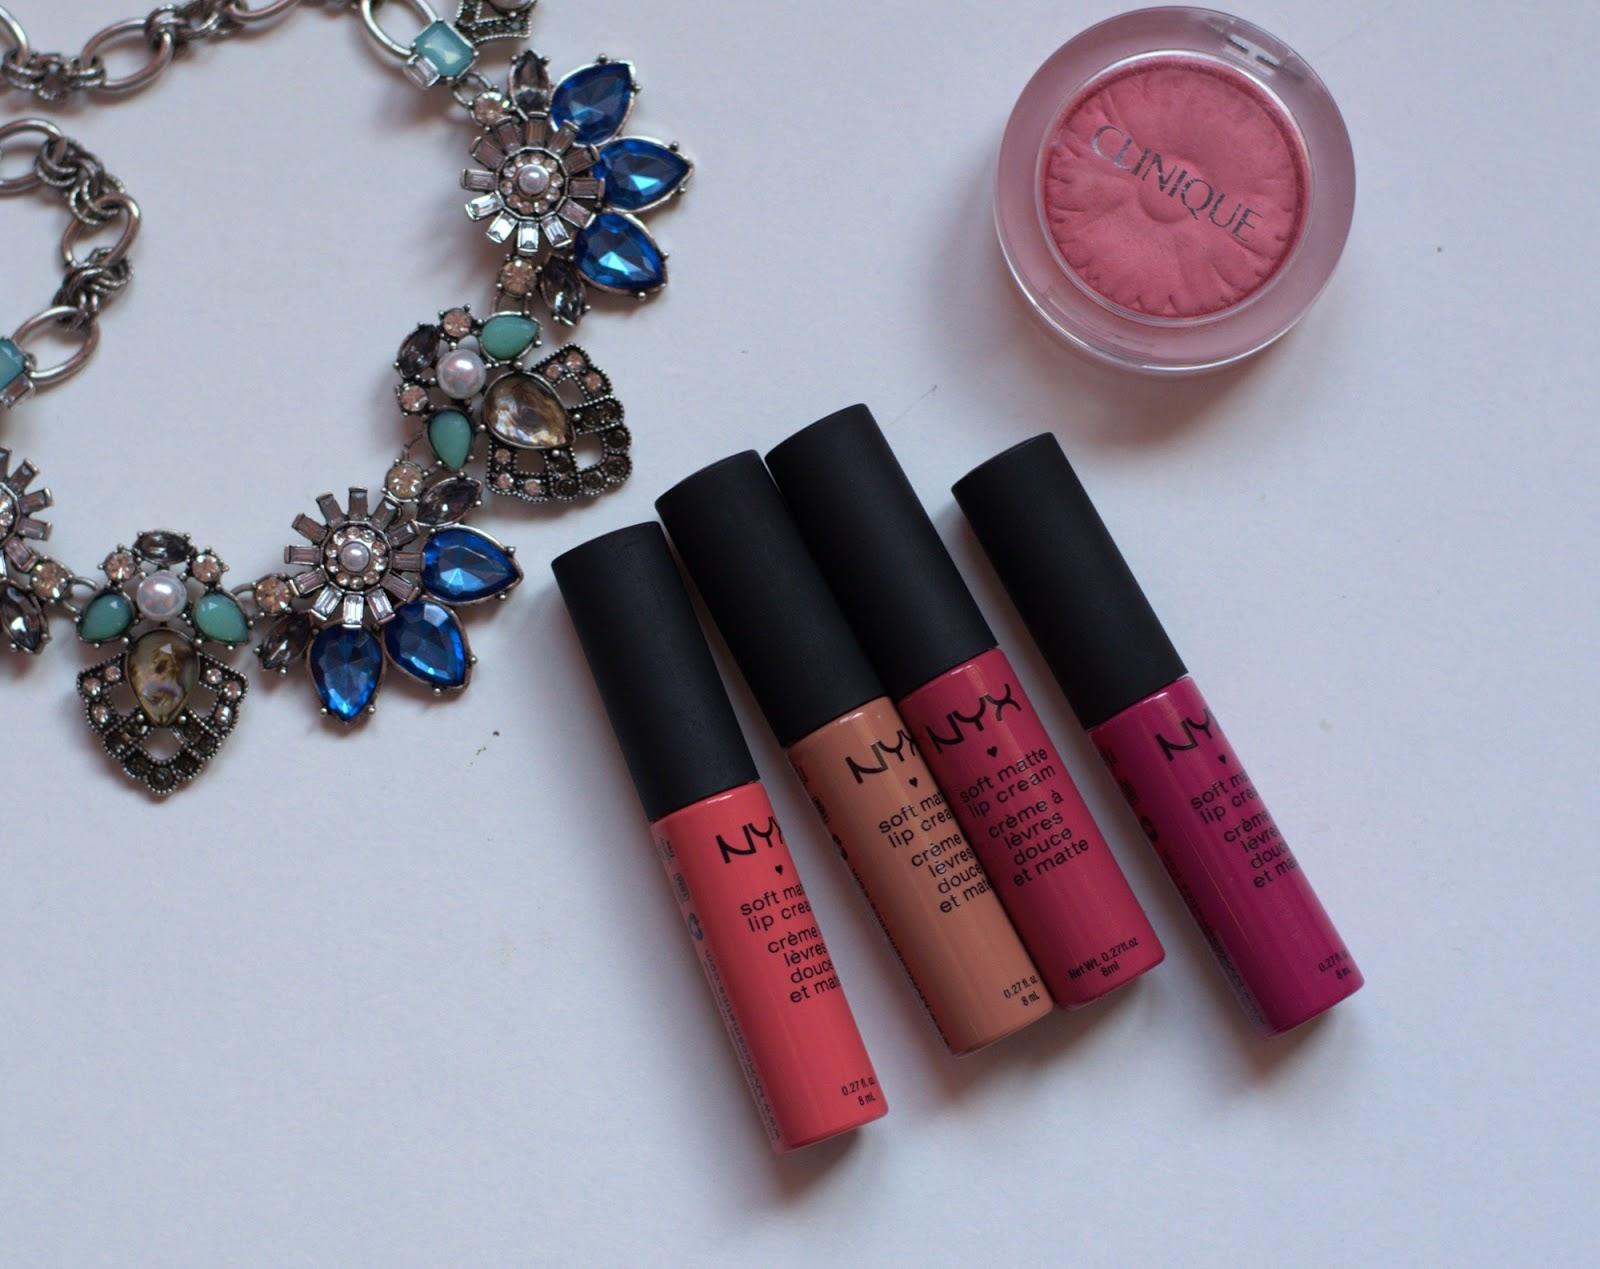 Nyx Soft Matte Lip Cream Review Swatch Andreea şerban